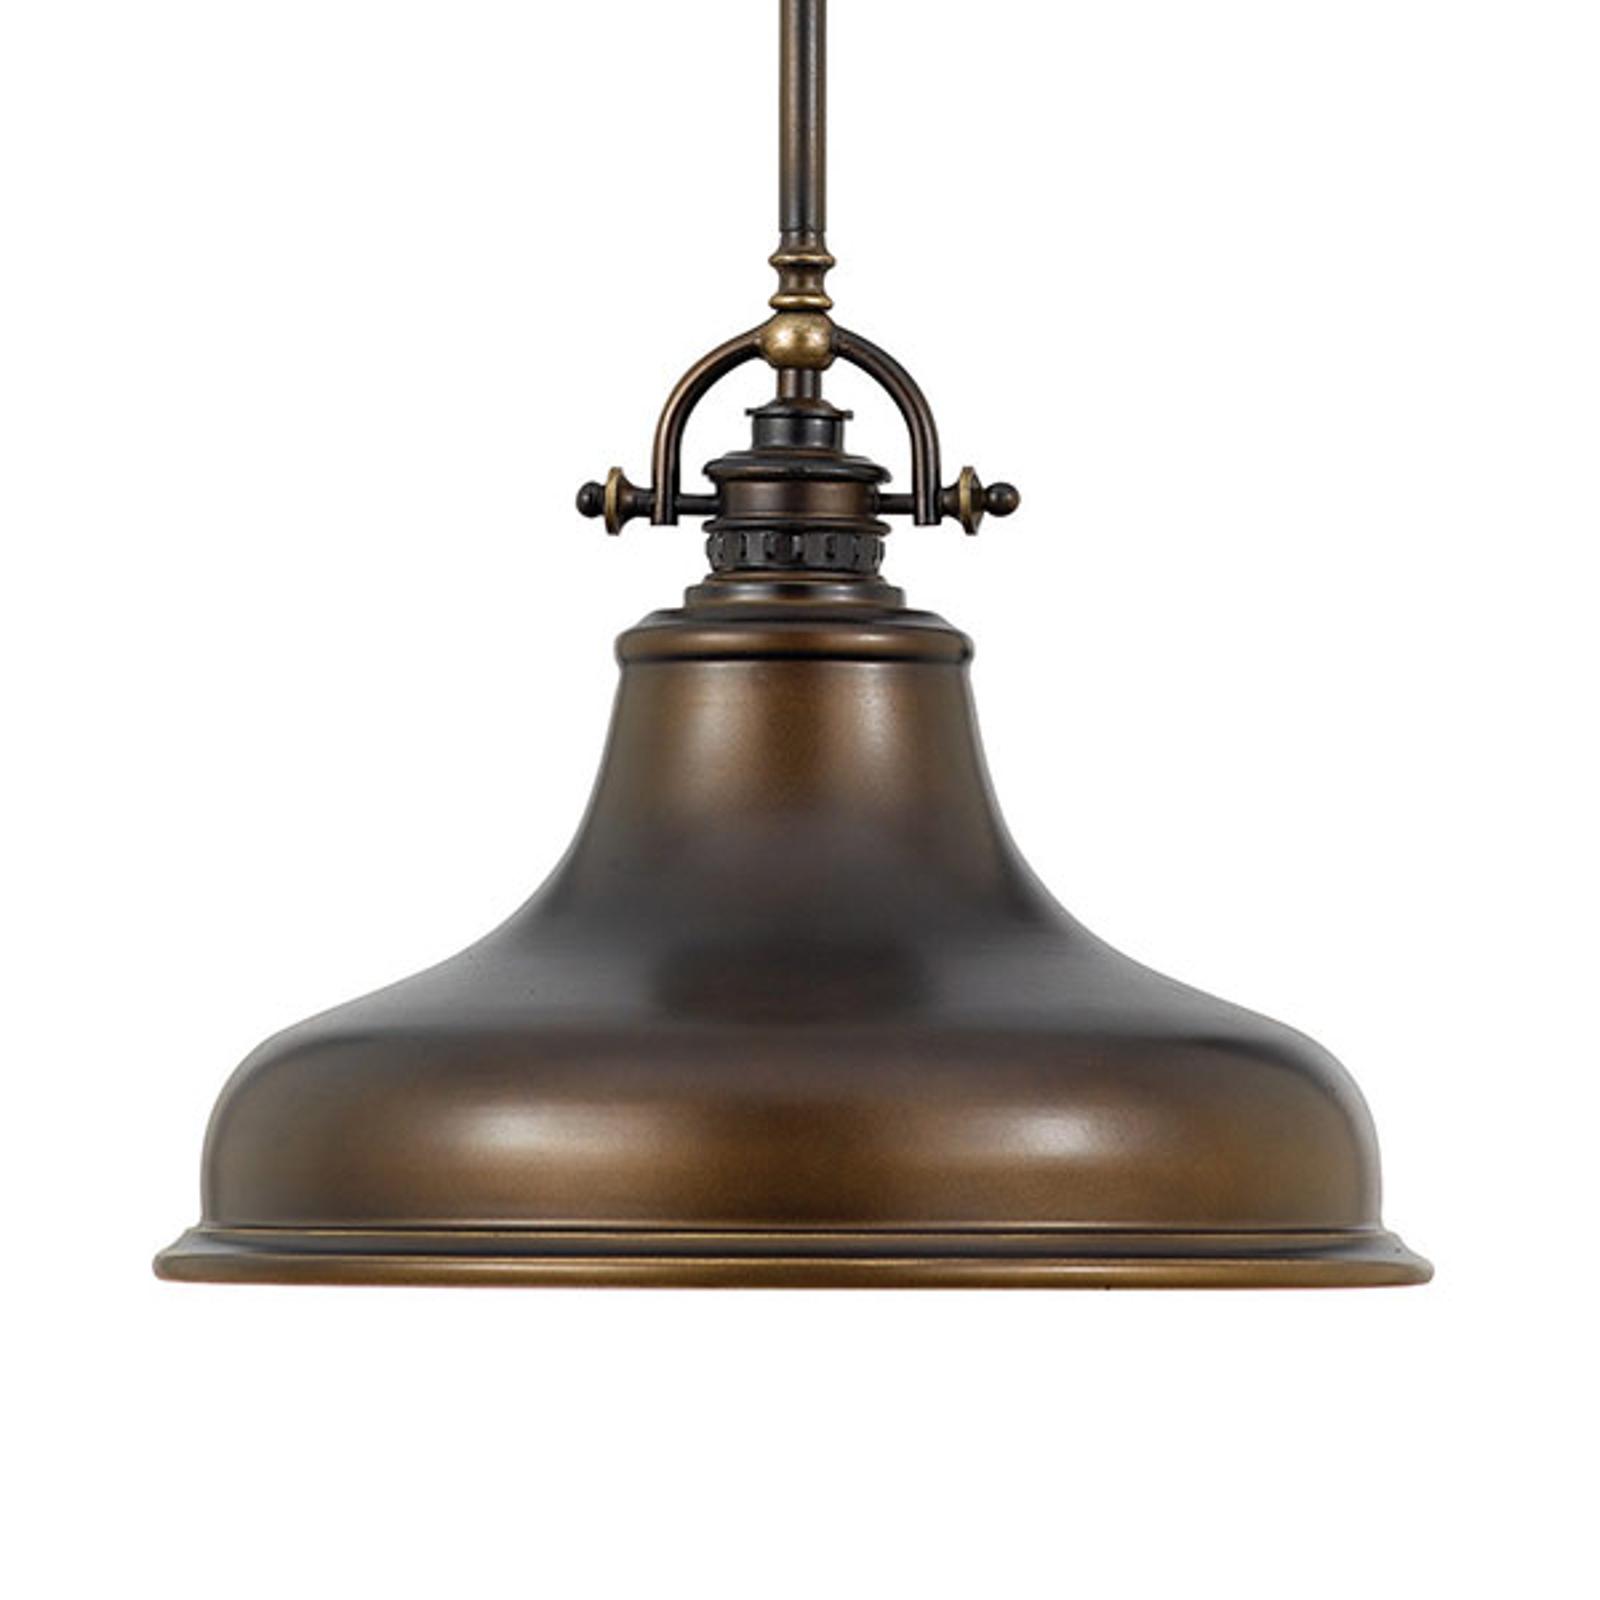 Suspension Emery 1 lampe bronze Ø 34,3cm